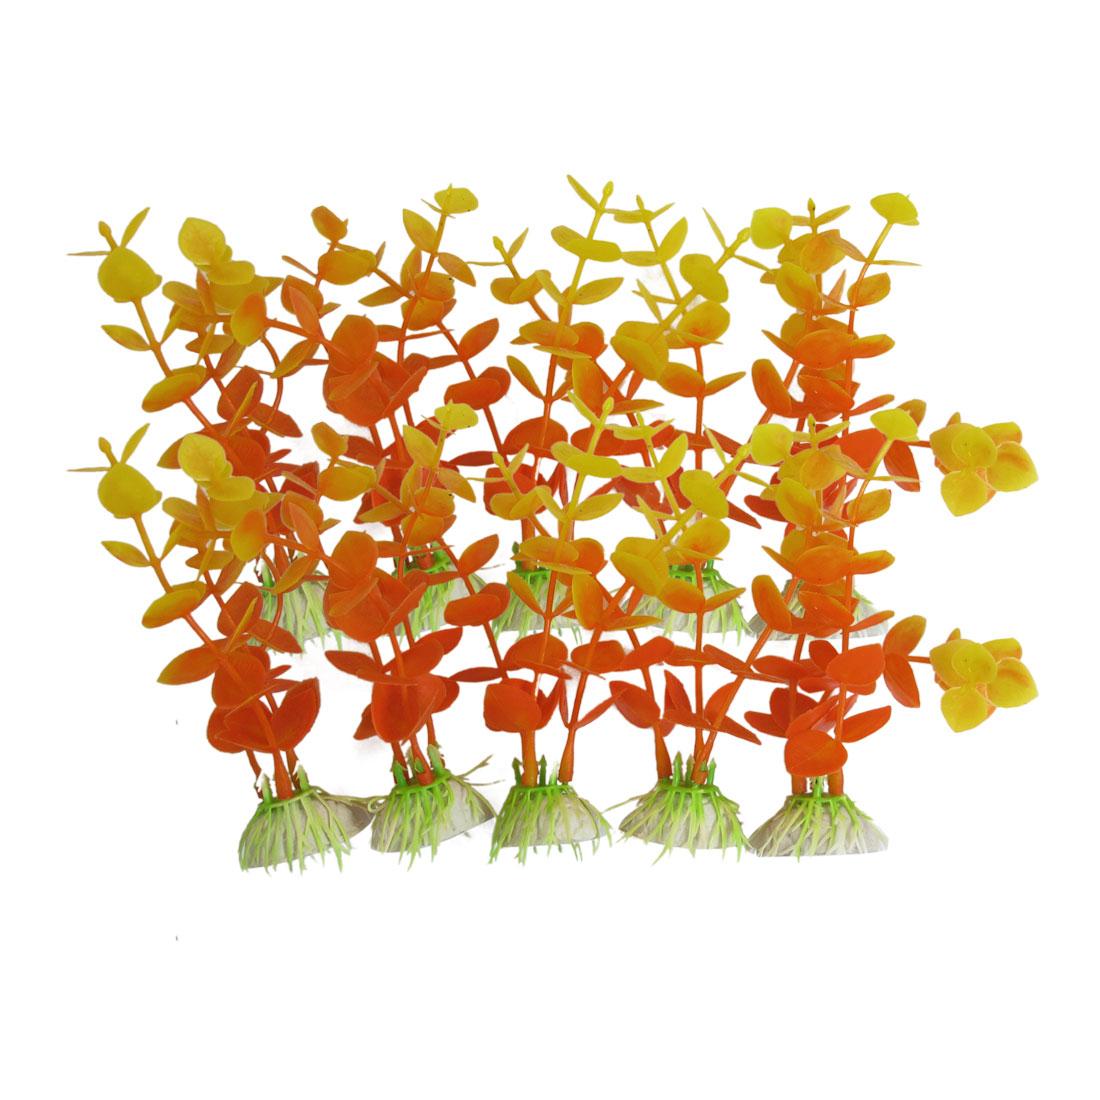 "10 Pcs Tank Aquarium Yellow Orange Plastic Aquatic Grass Plant Decor 4.7"" Height"